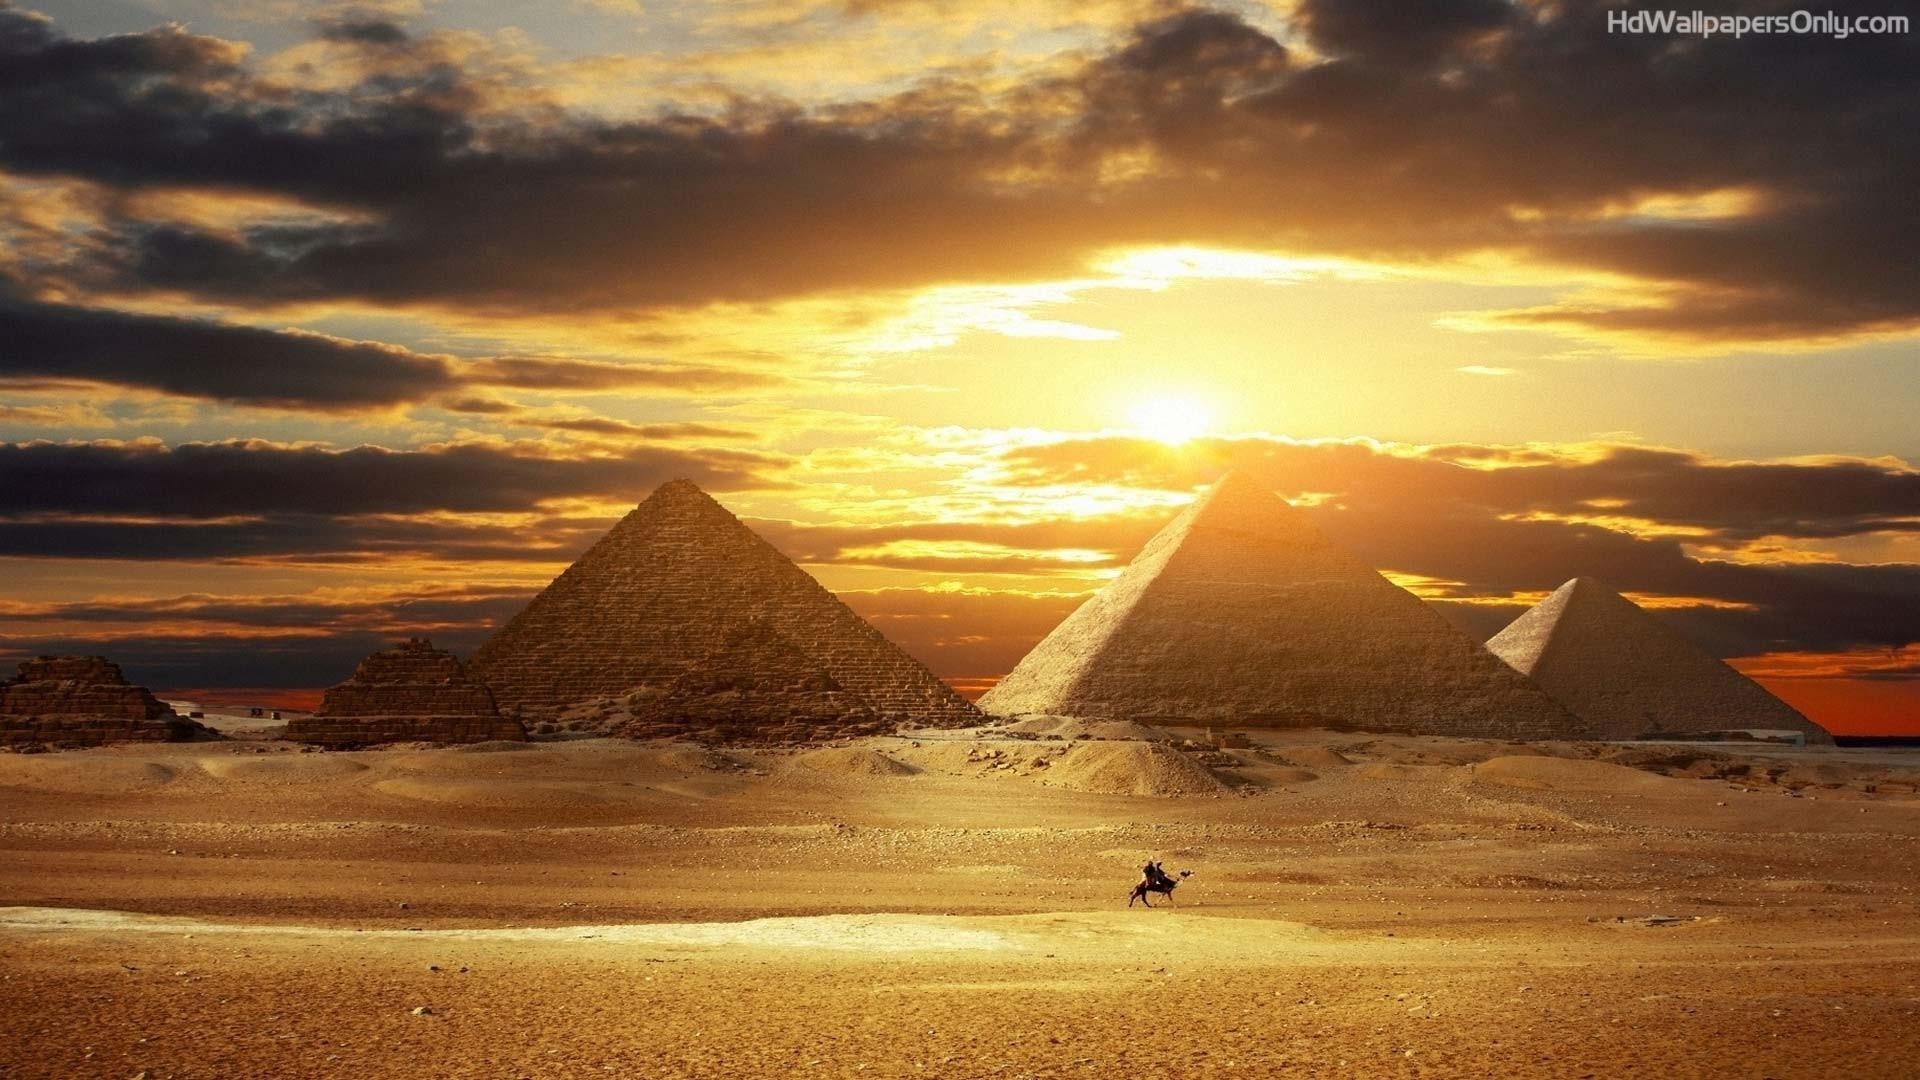 egypt 4k ultra hd wallpaper 0017